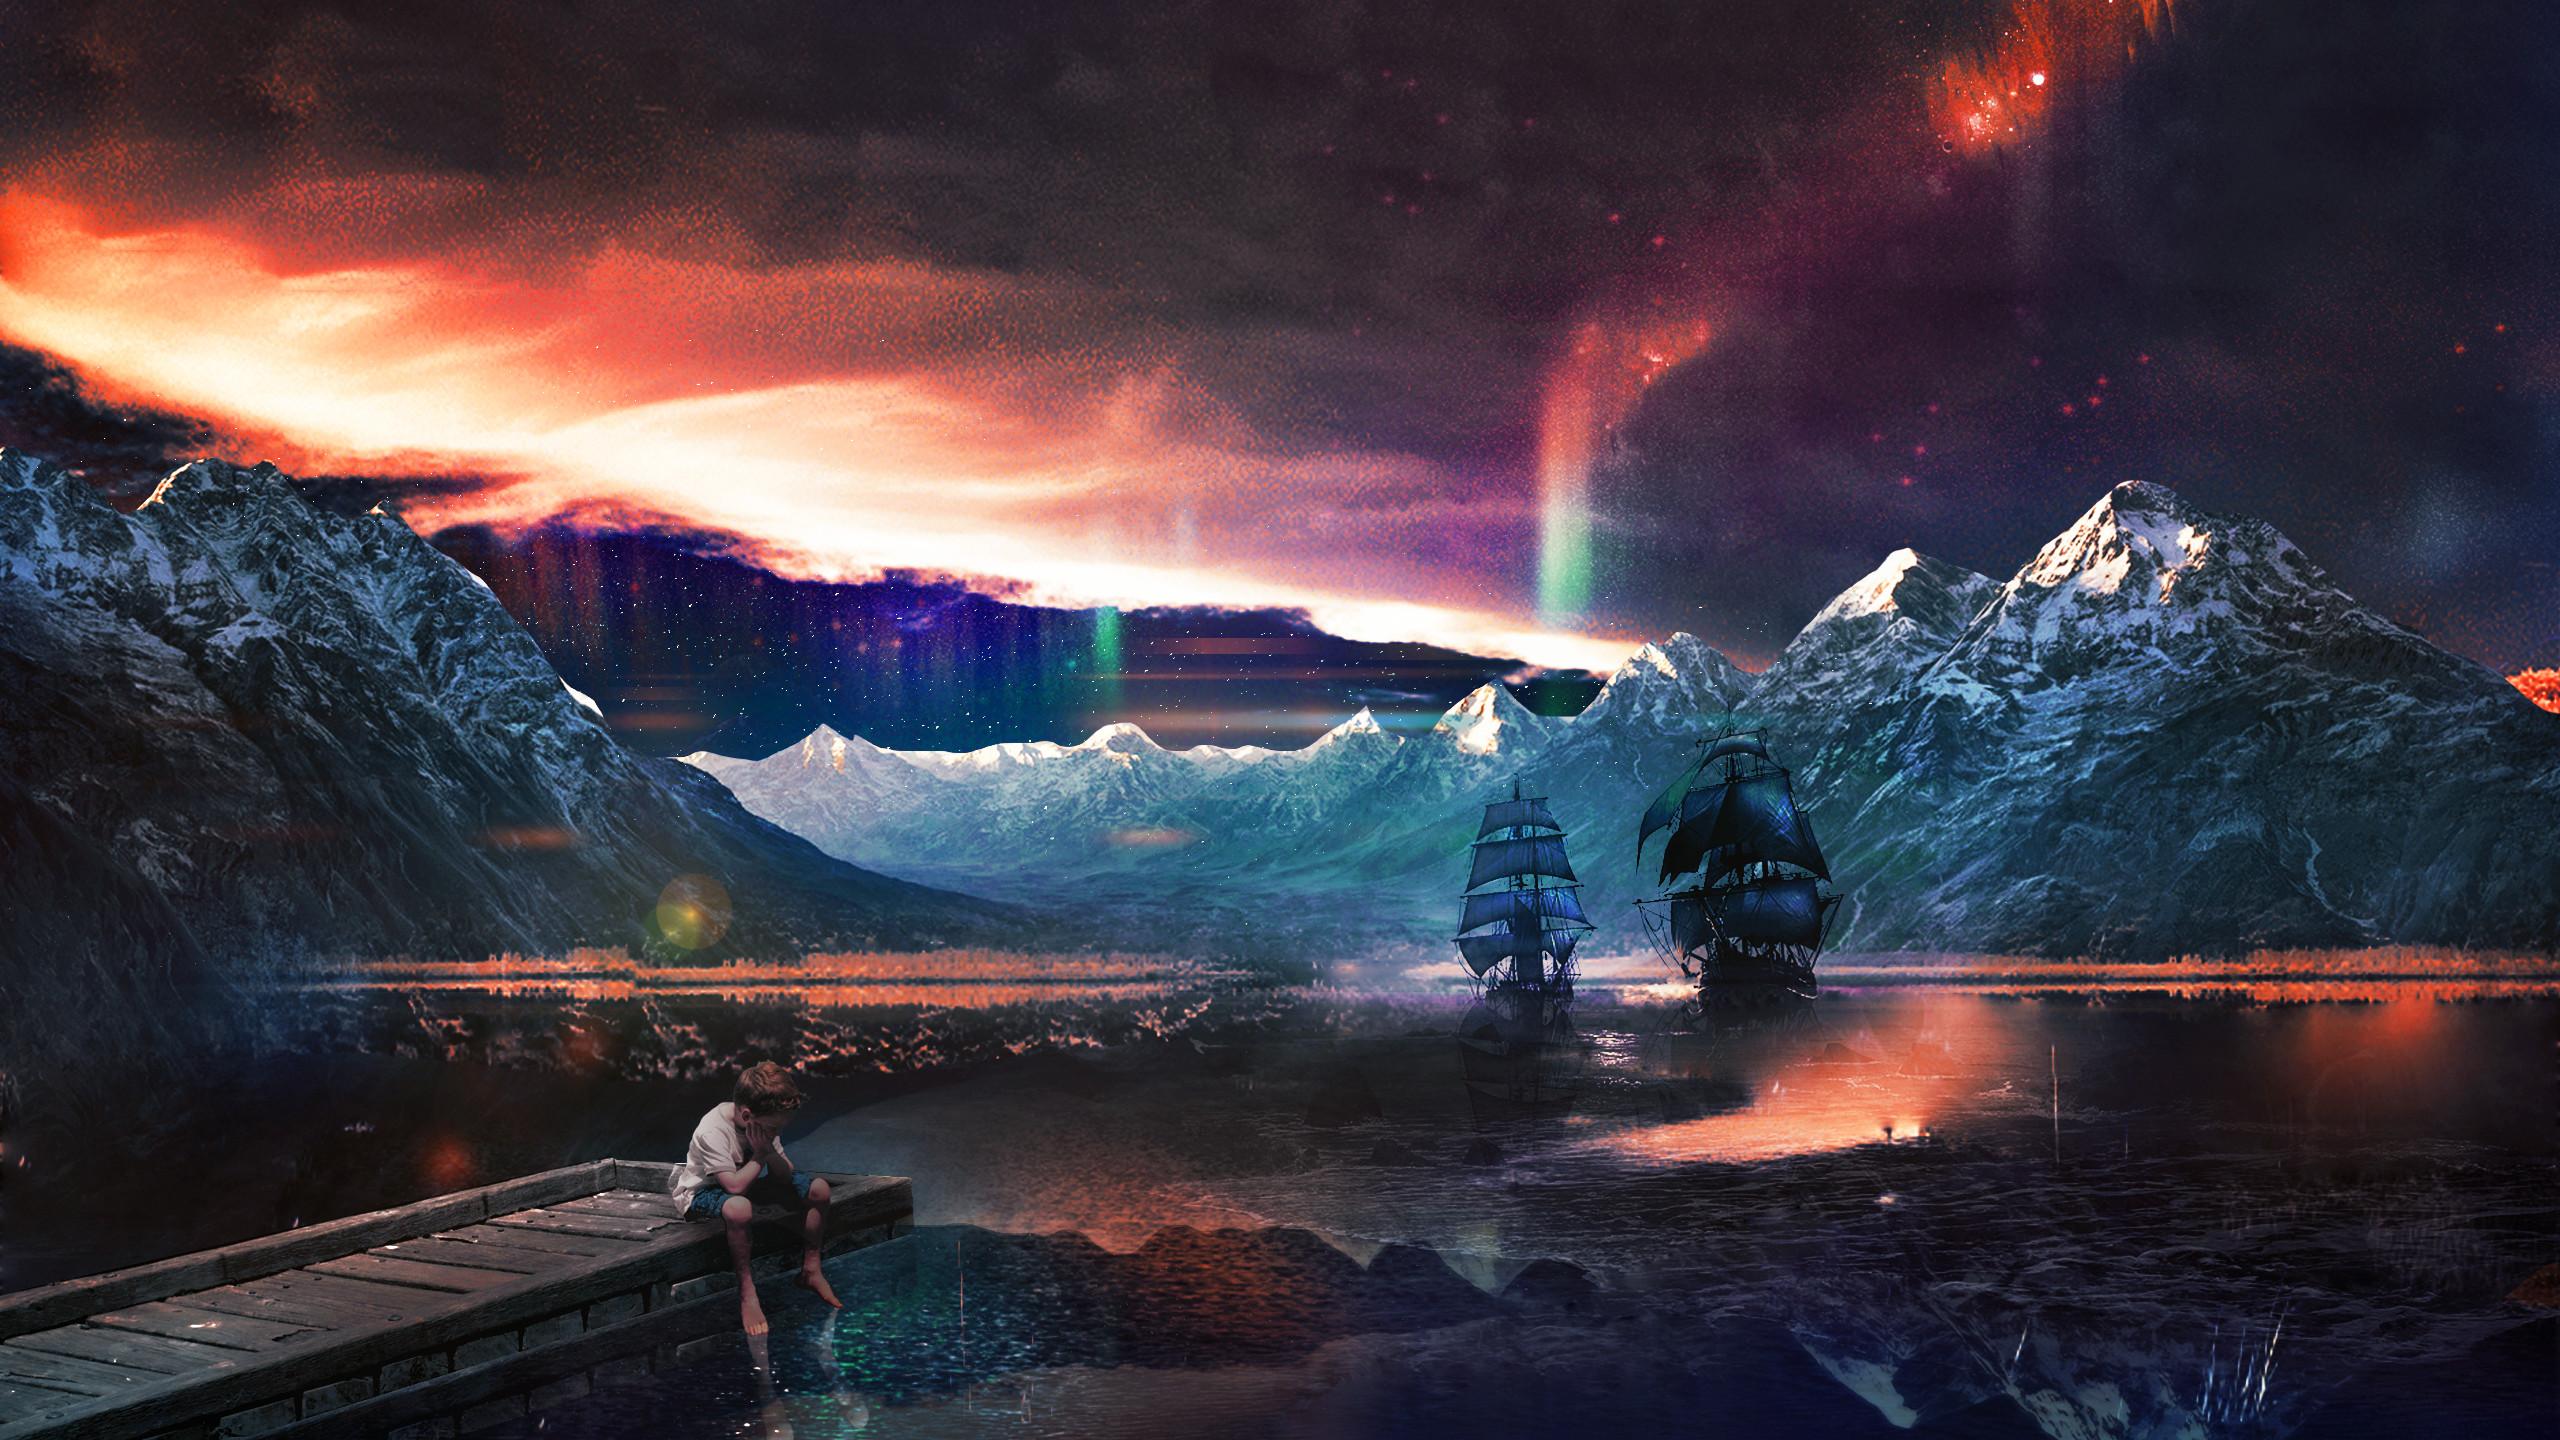 Space fantasy wallpaper wallpapertag - Space 2560 x 1440 ...